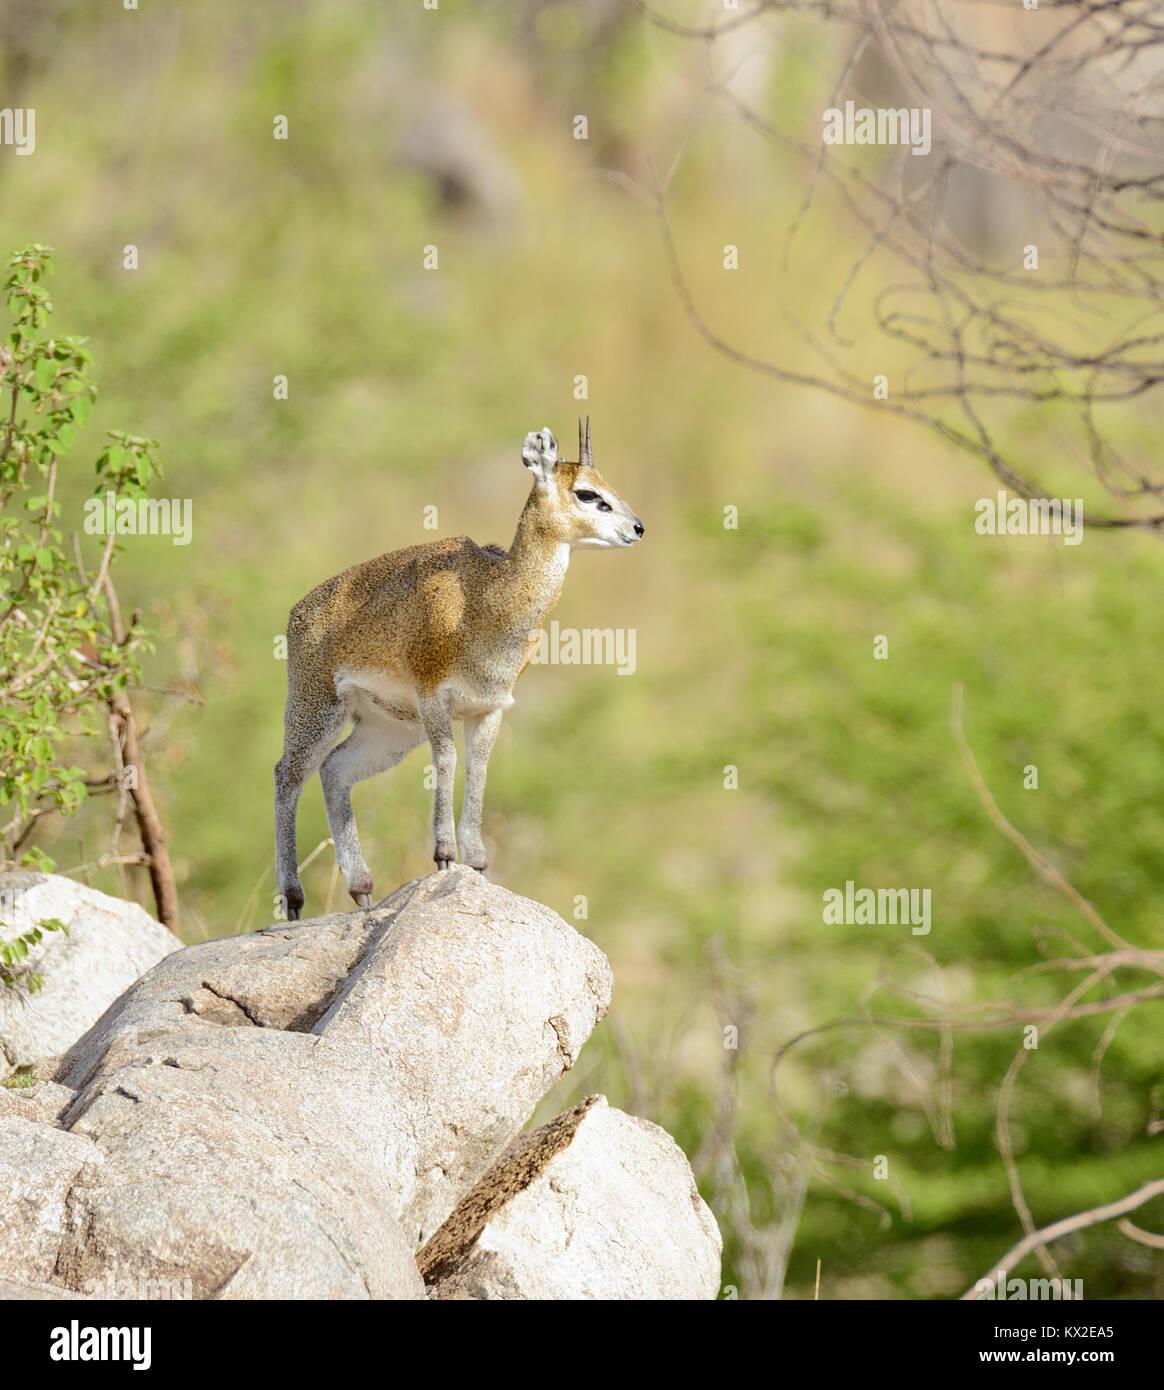 Closeup of Klipspringer in the Serengeti National park, Tanzania - Stock Image